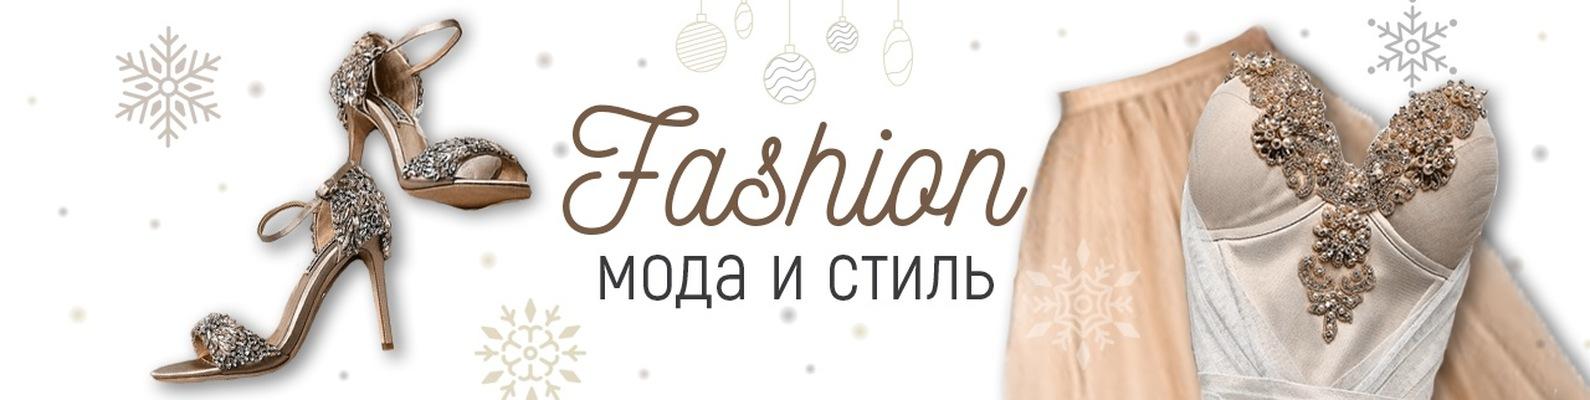 d7ab2565ef13 Fashion - мода и стиль   ВКонтакте